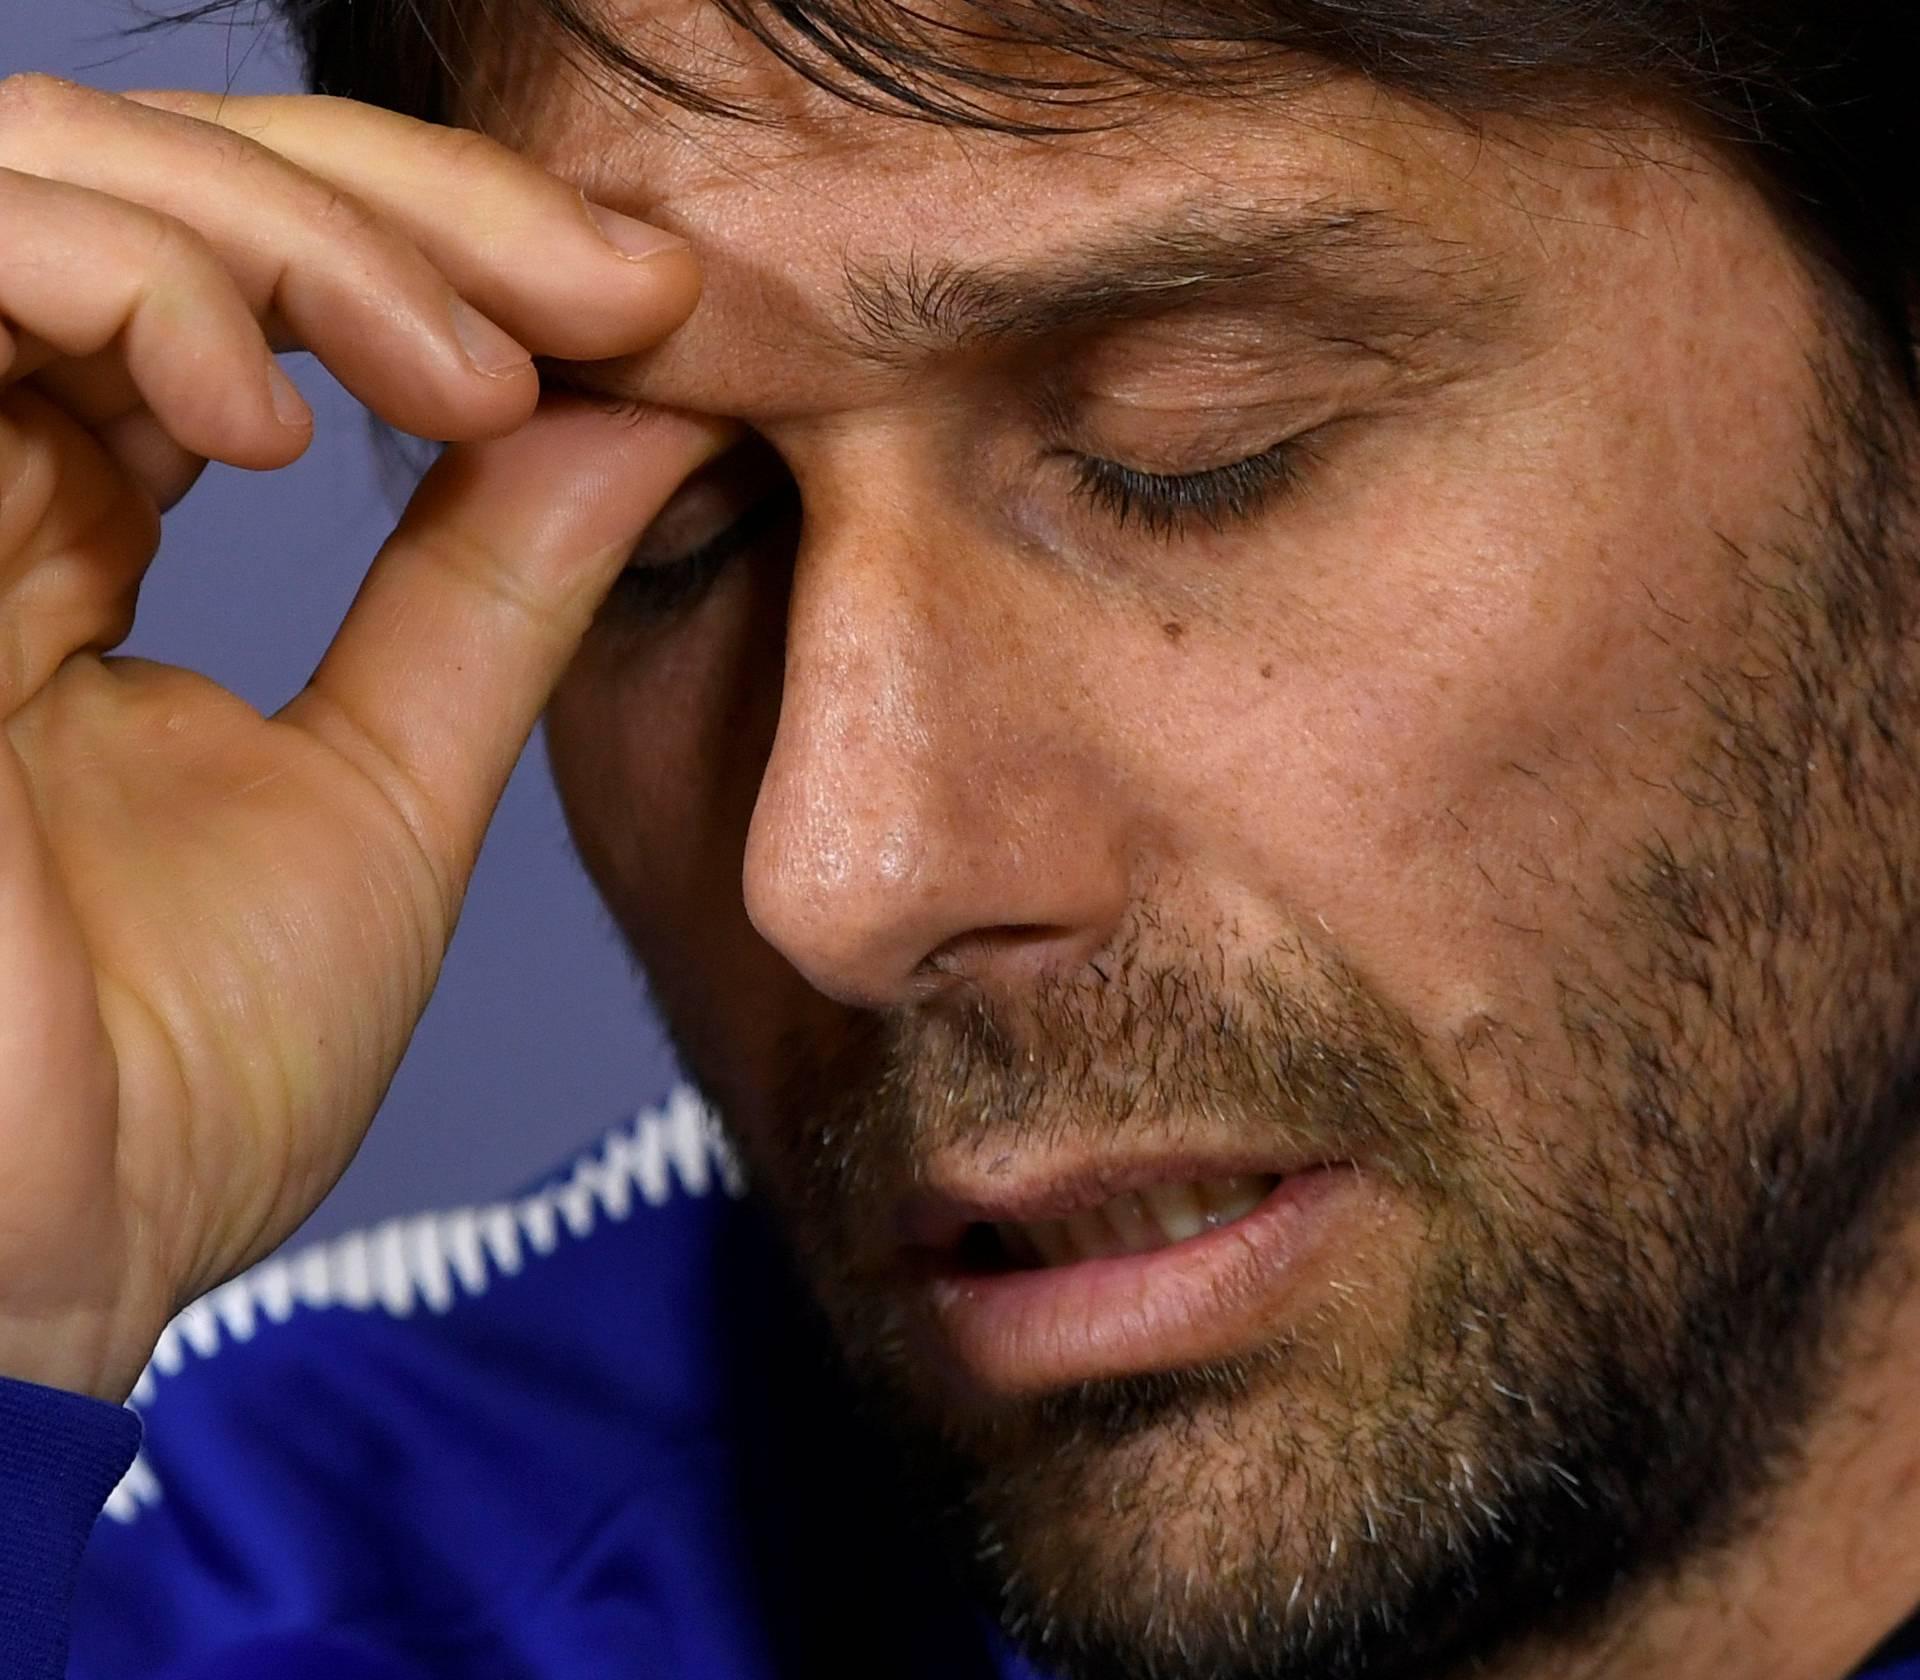 Premier League - Chelsea - Antonio Conte Press Conference